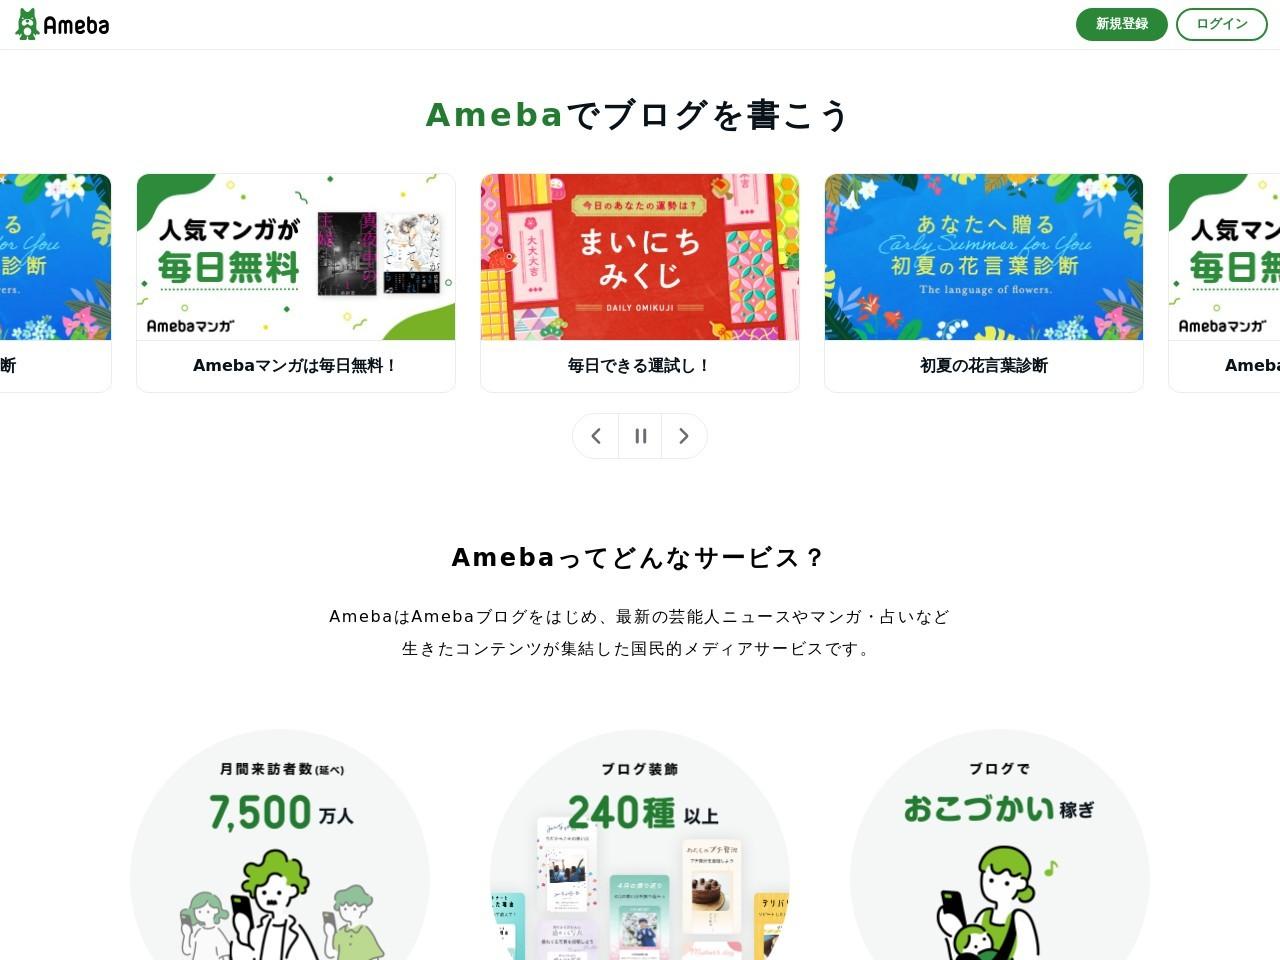 http://ameblo.jp/jewebea/